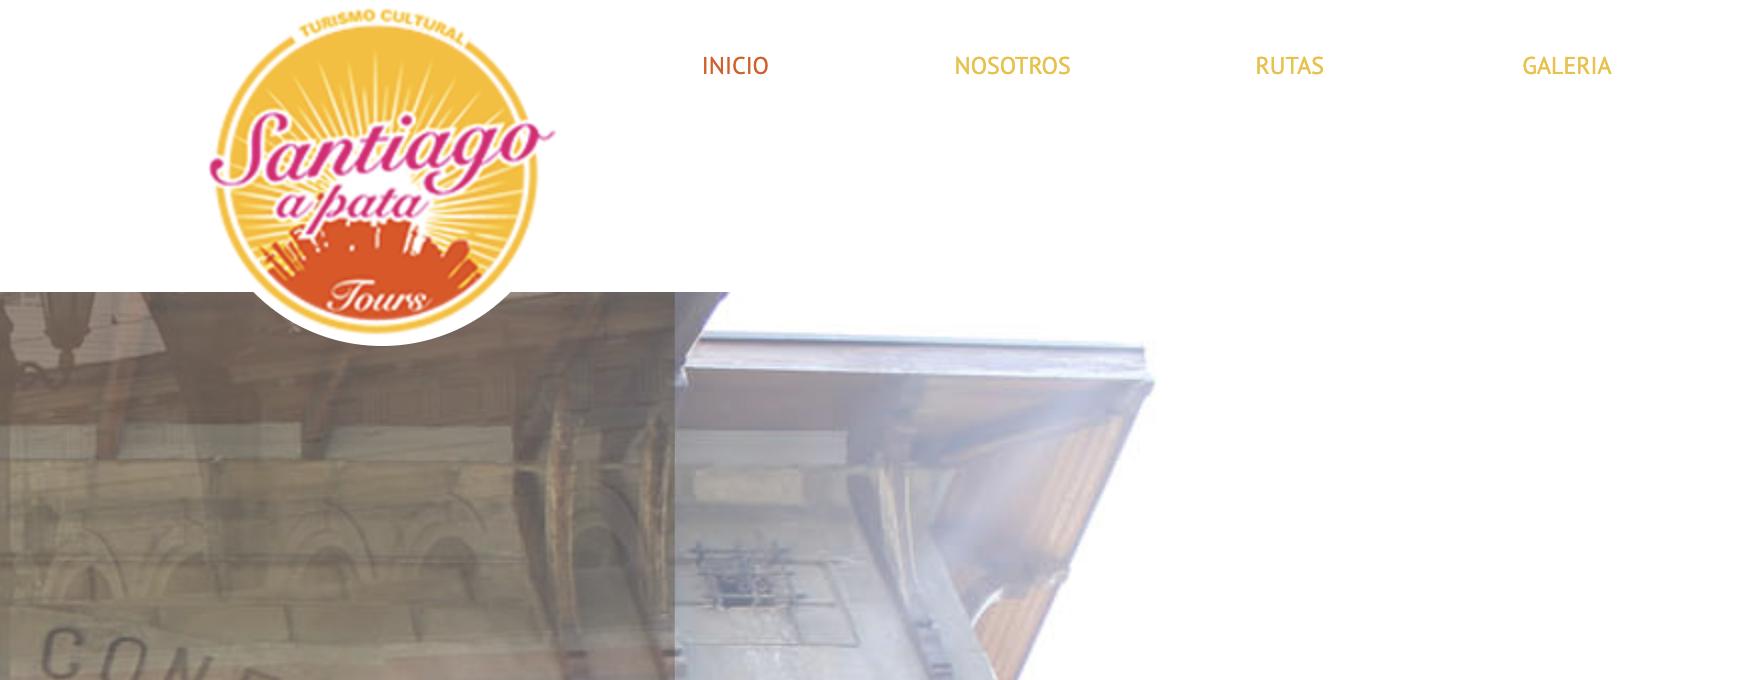 Santiago a Pata; la Startup del Turismo Joven